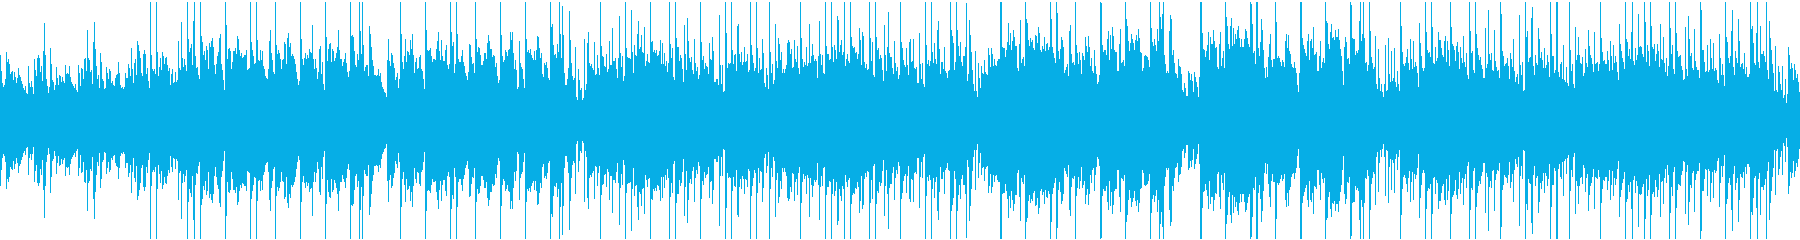 Refreshing violin / loop / intro 9 seconds's reproduced waveform